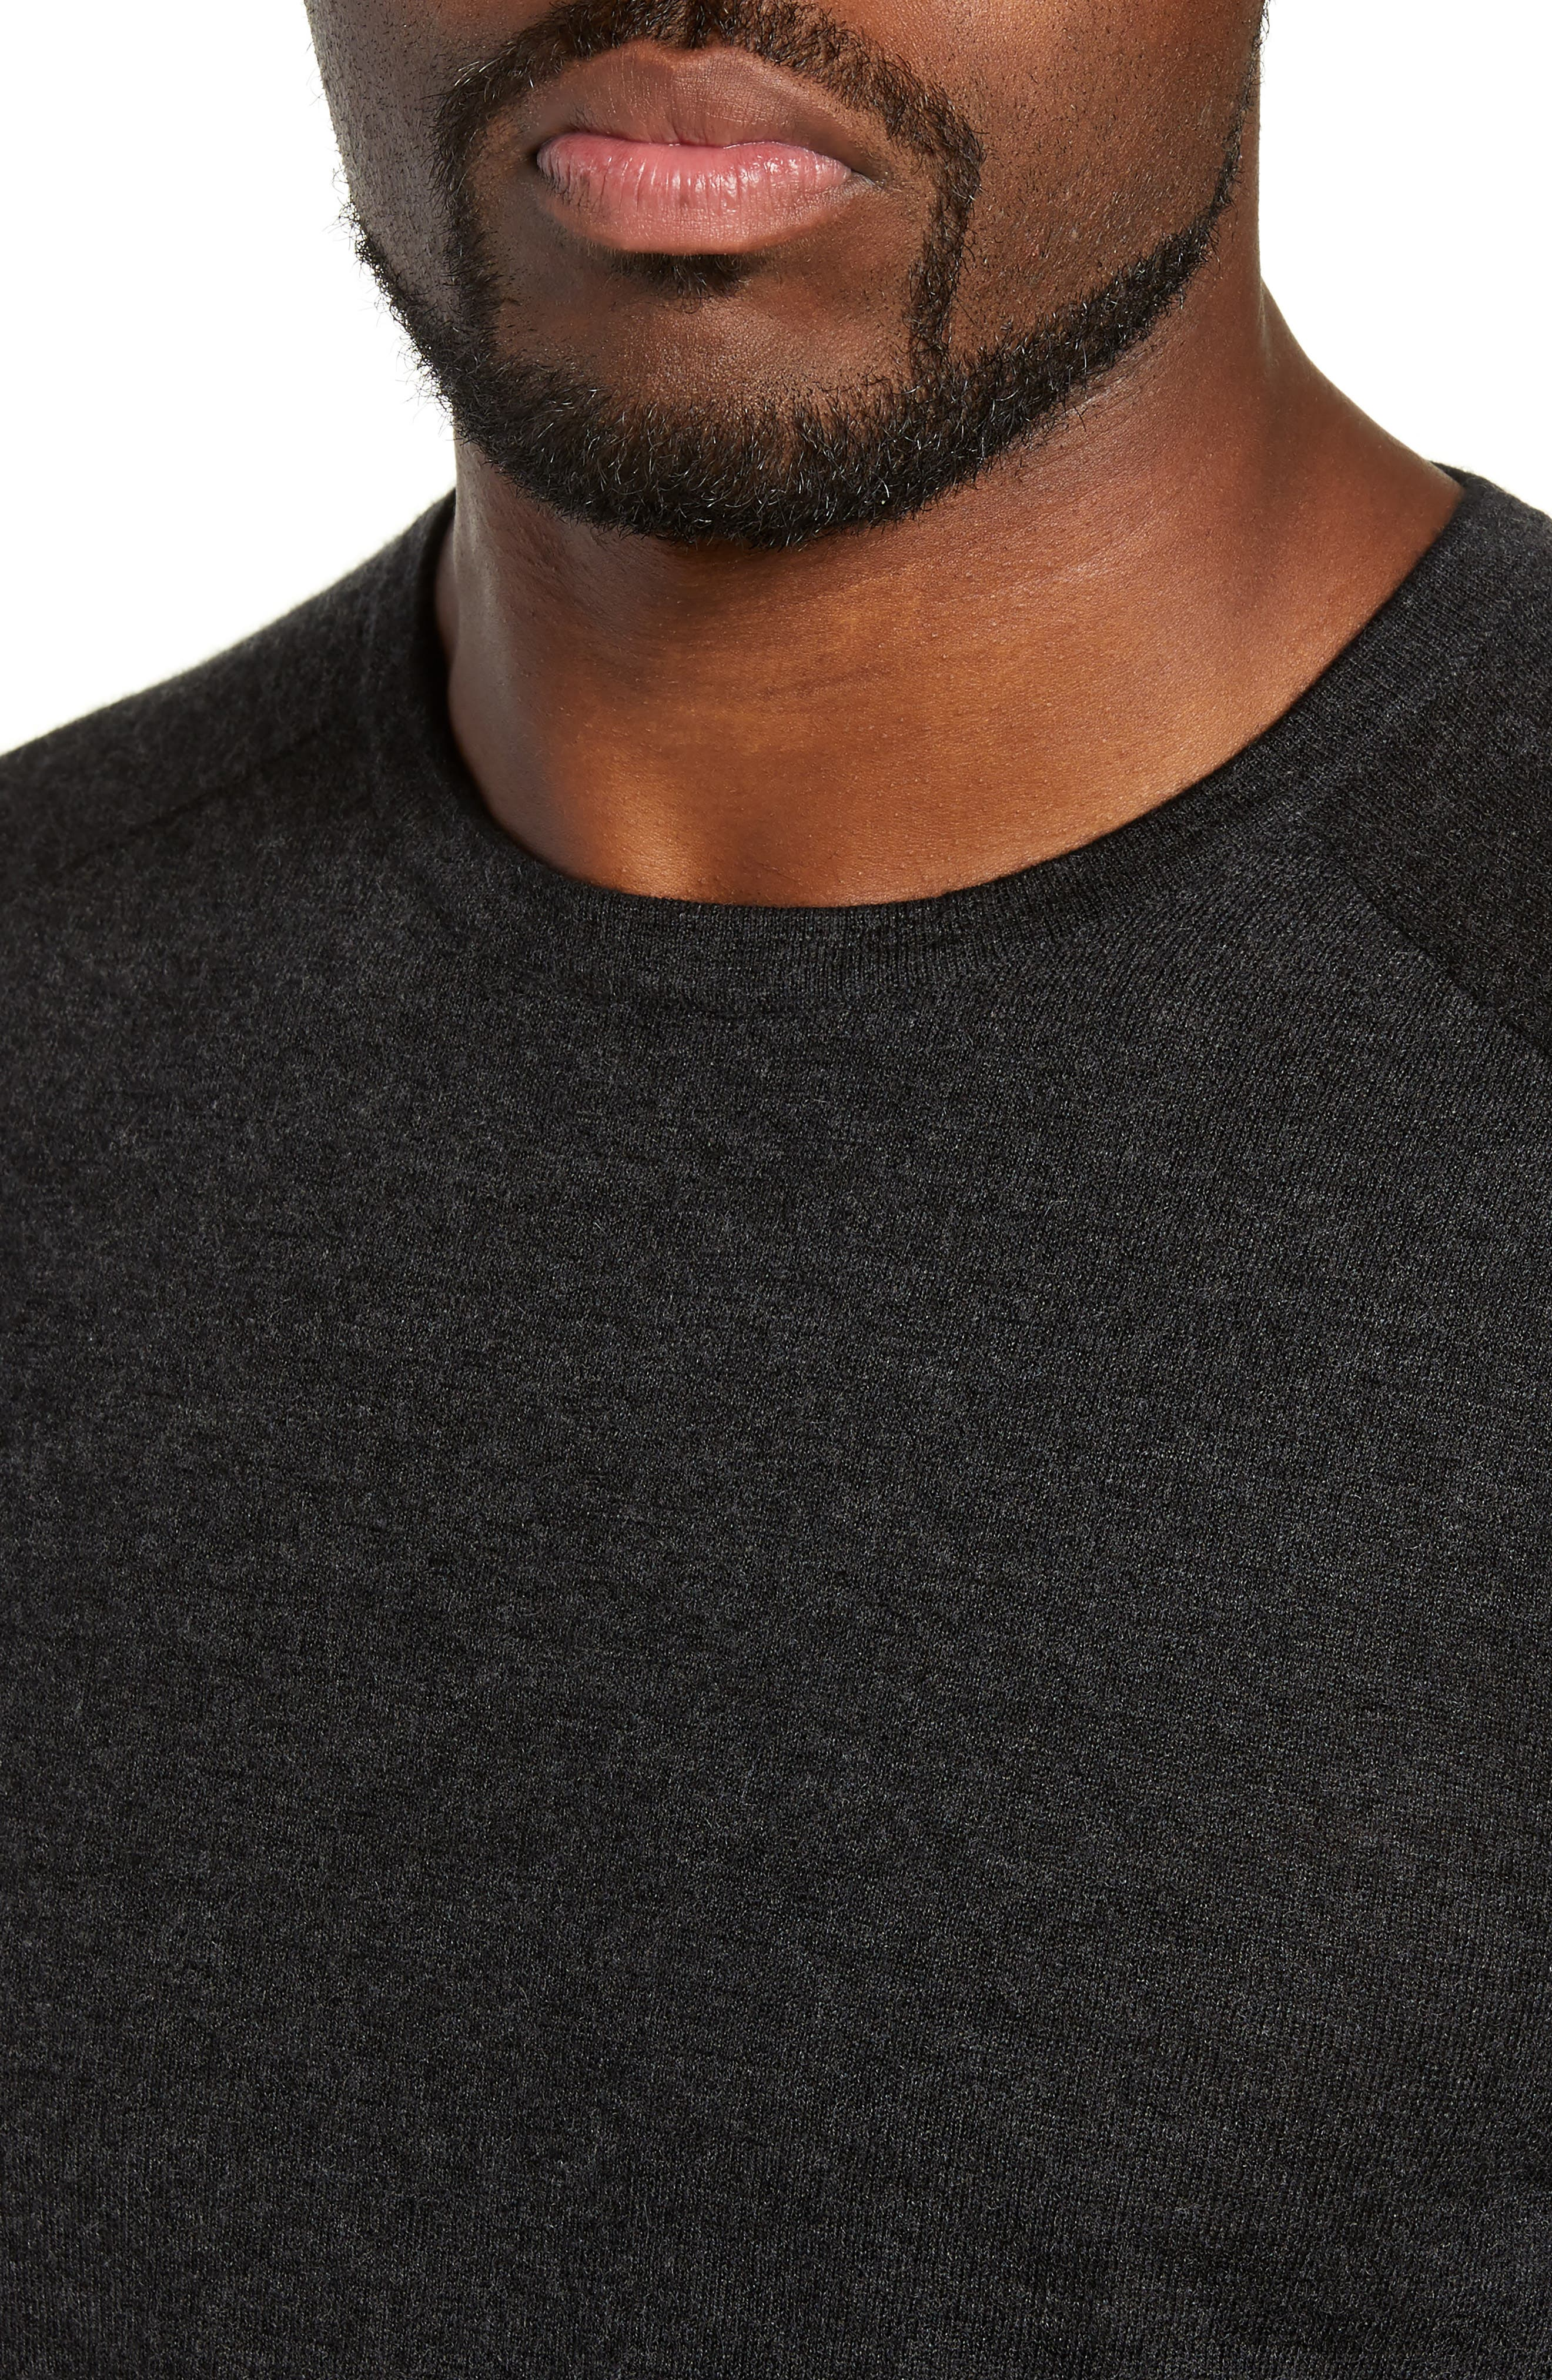 NORDSTROM SIGNATURE,                             Cashmere Crewneck Sweater,                             Alternate thumbnail 4, color,                             030